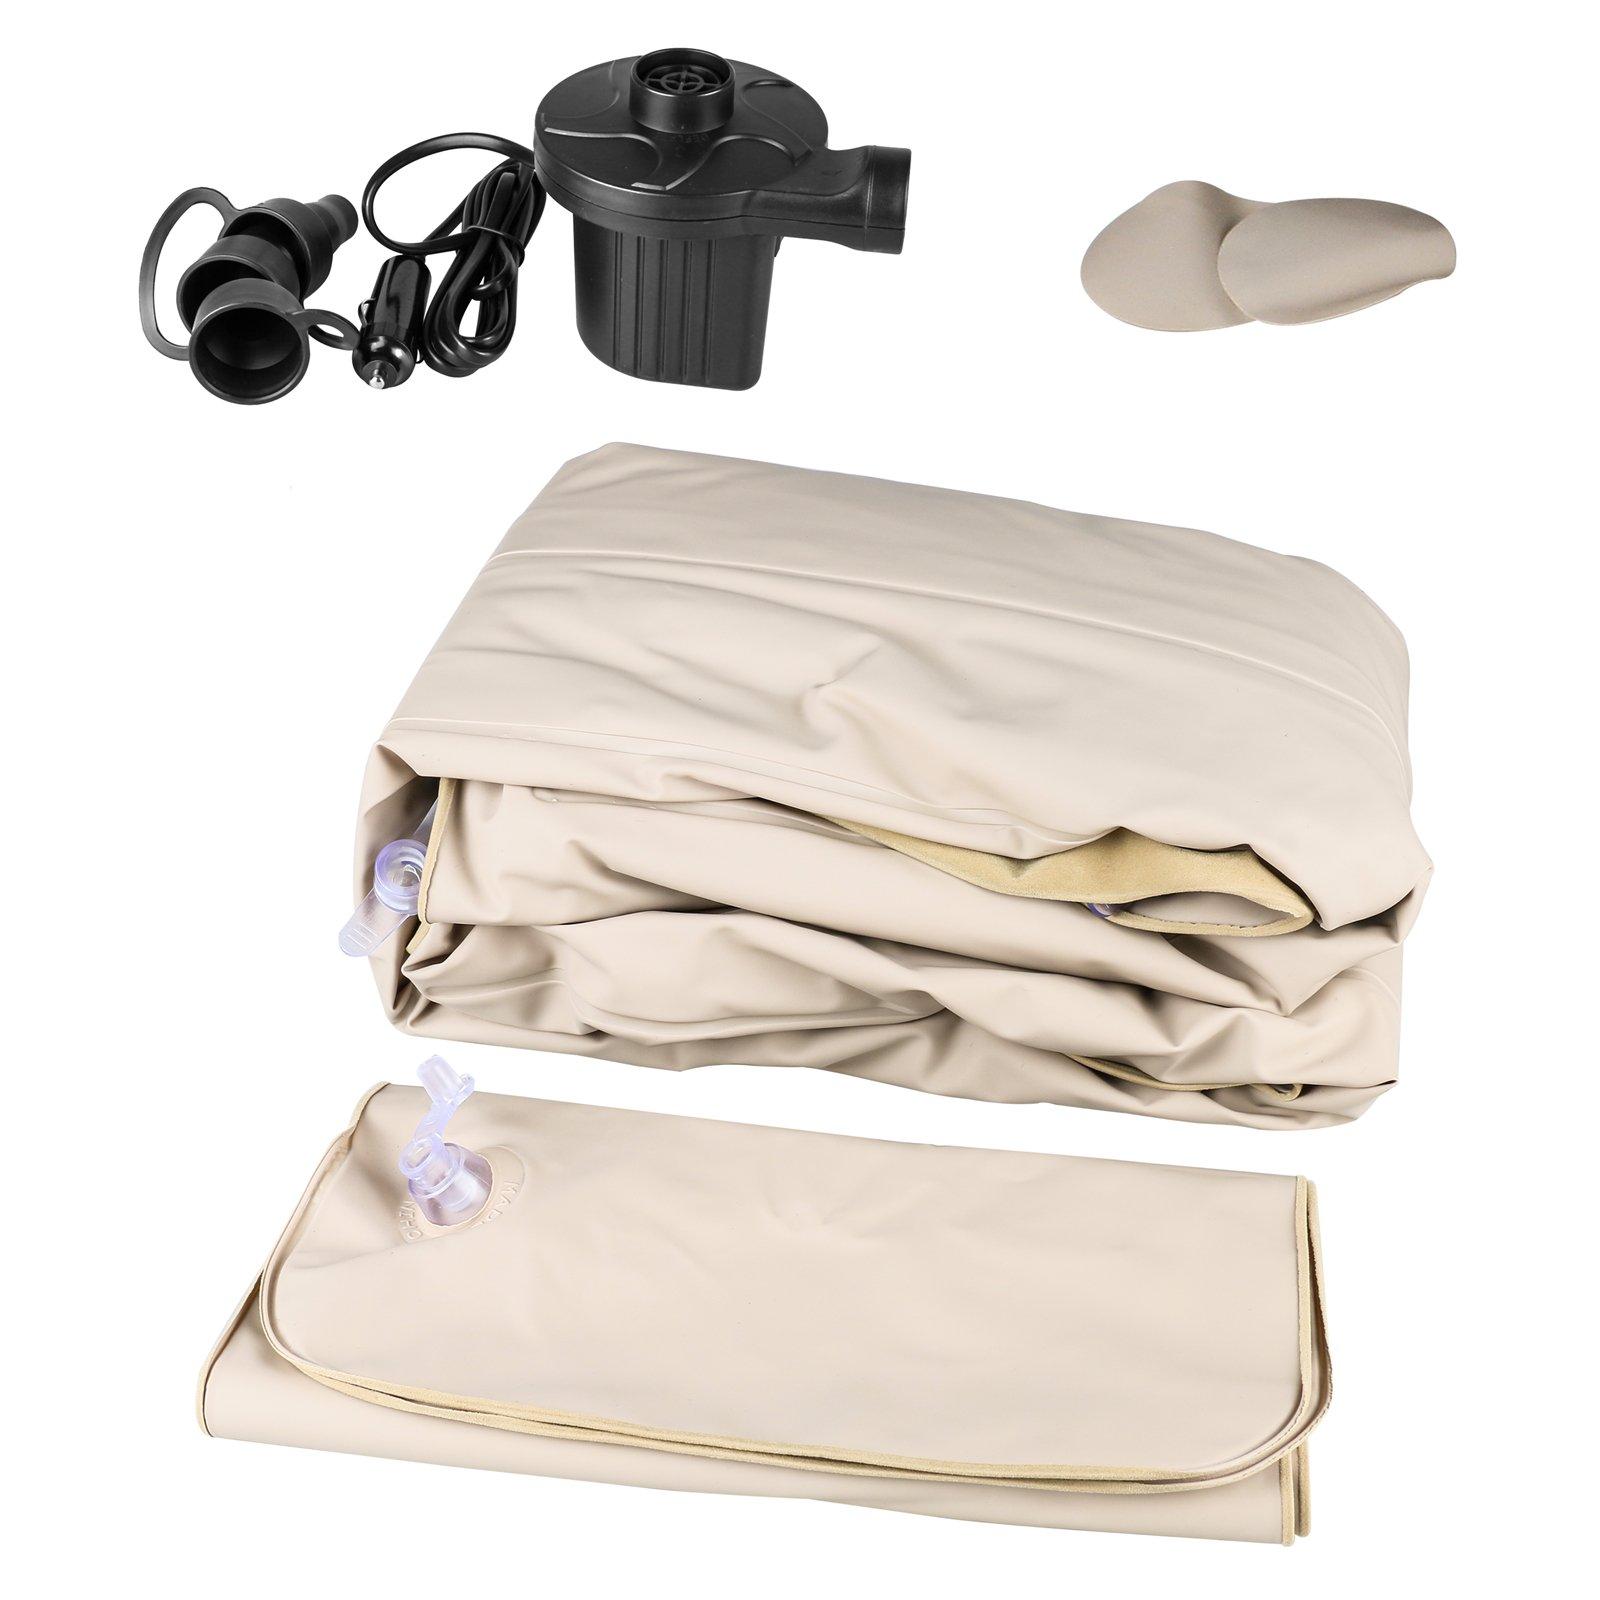 Mrcartool Car Travel Inflatable Mattress Air Bed Cushion Camping SUV Extended Air Couch with 2 Air Pillows+12V Air Pump by Mrcartool